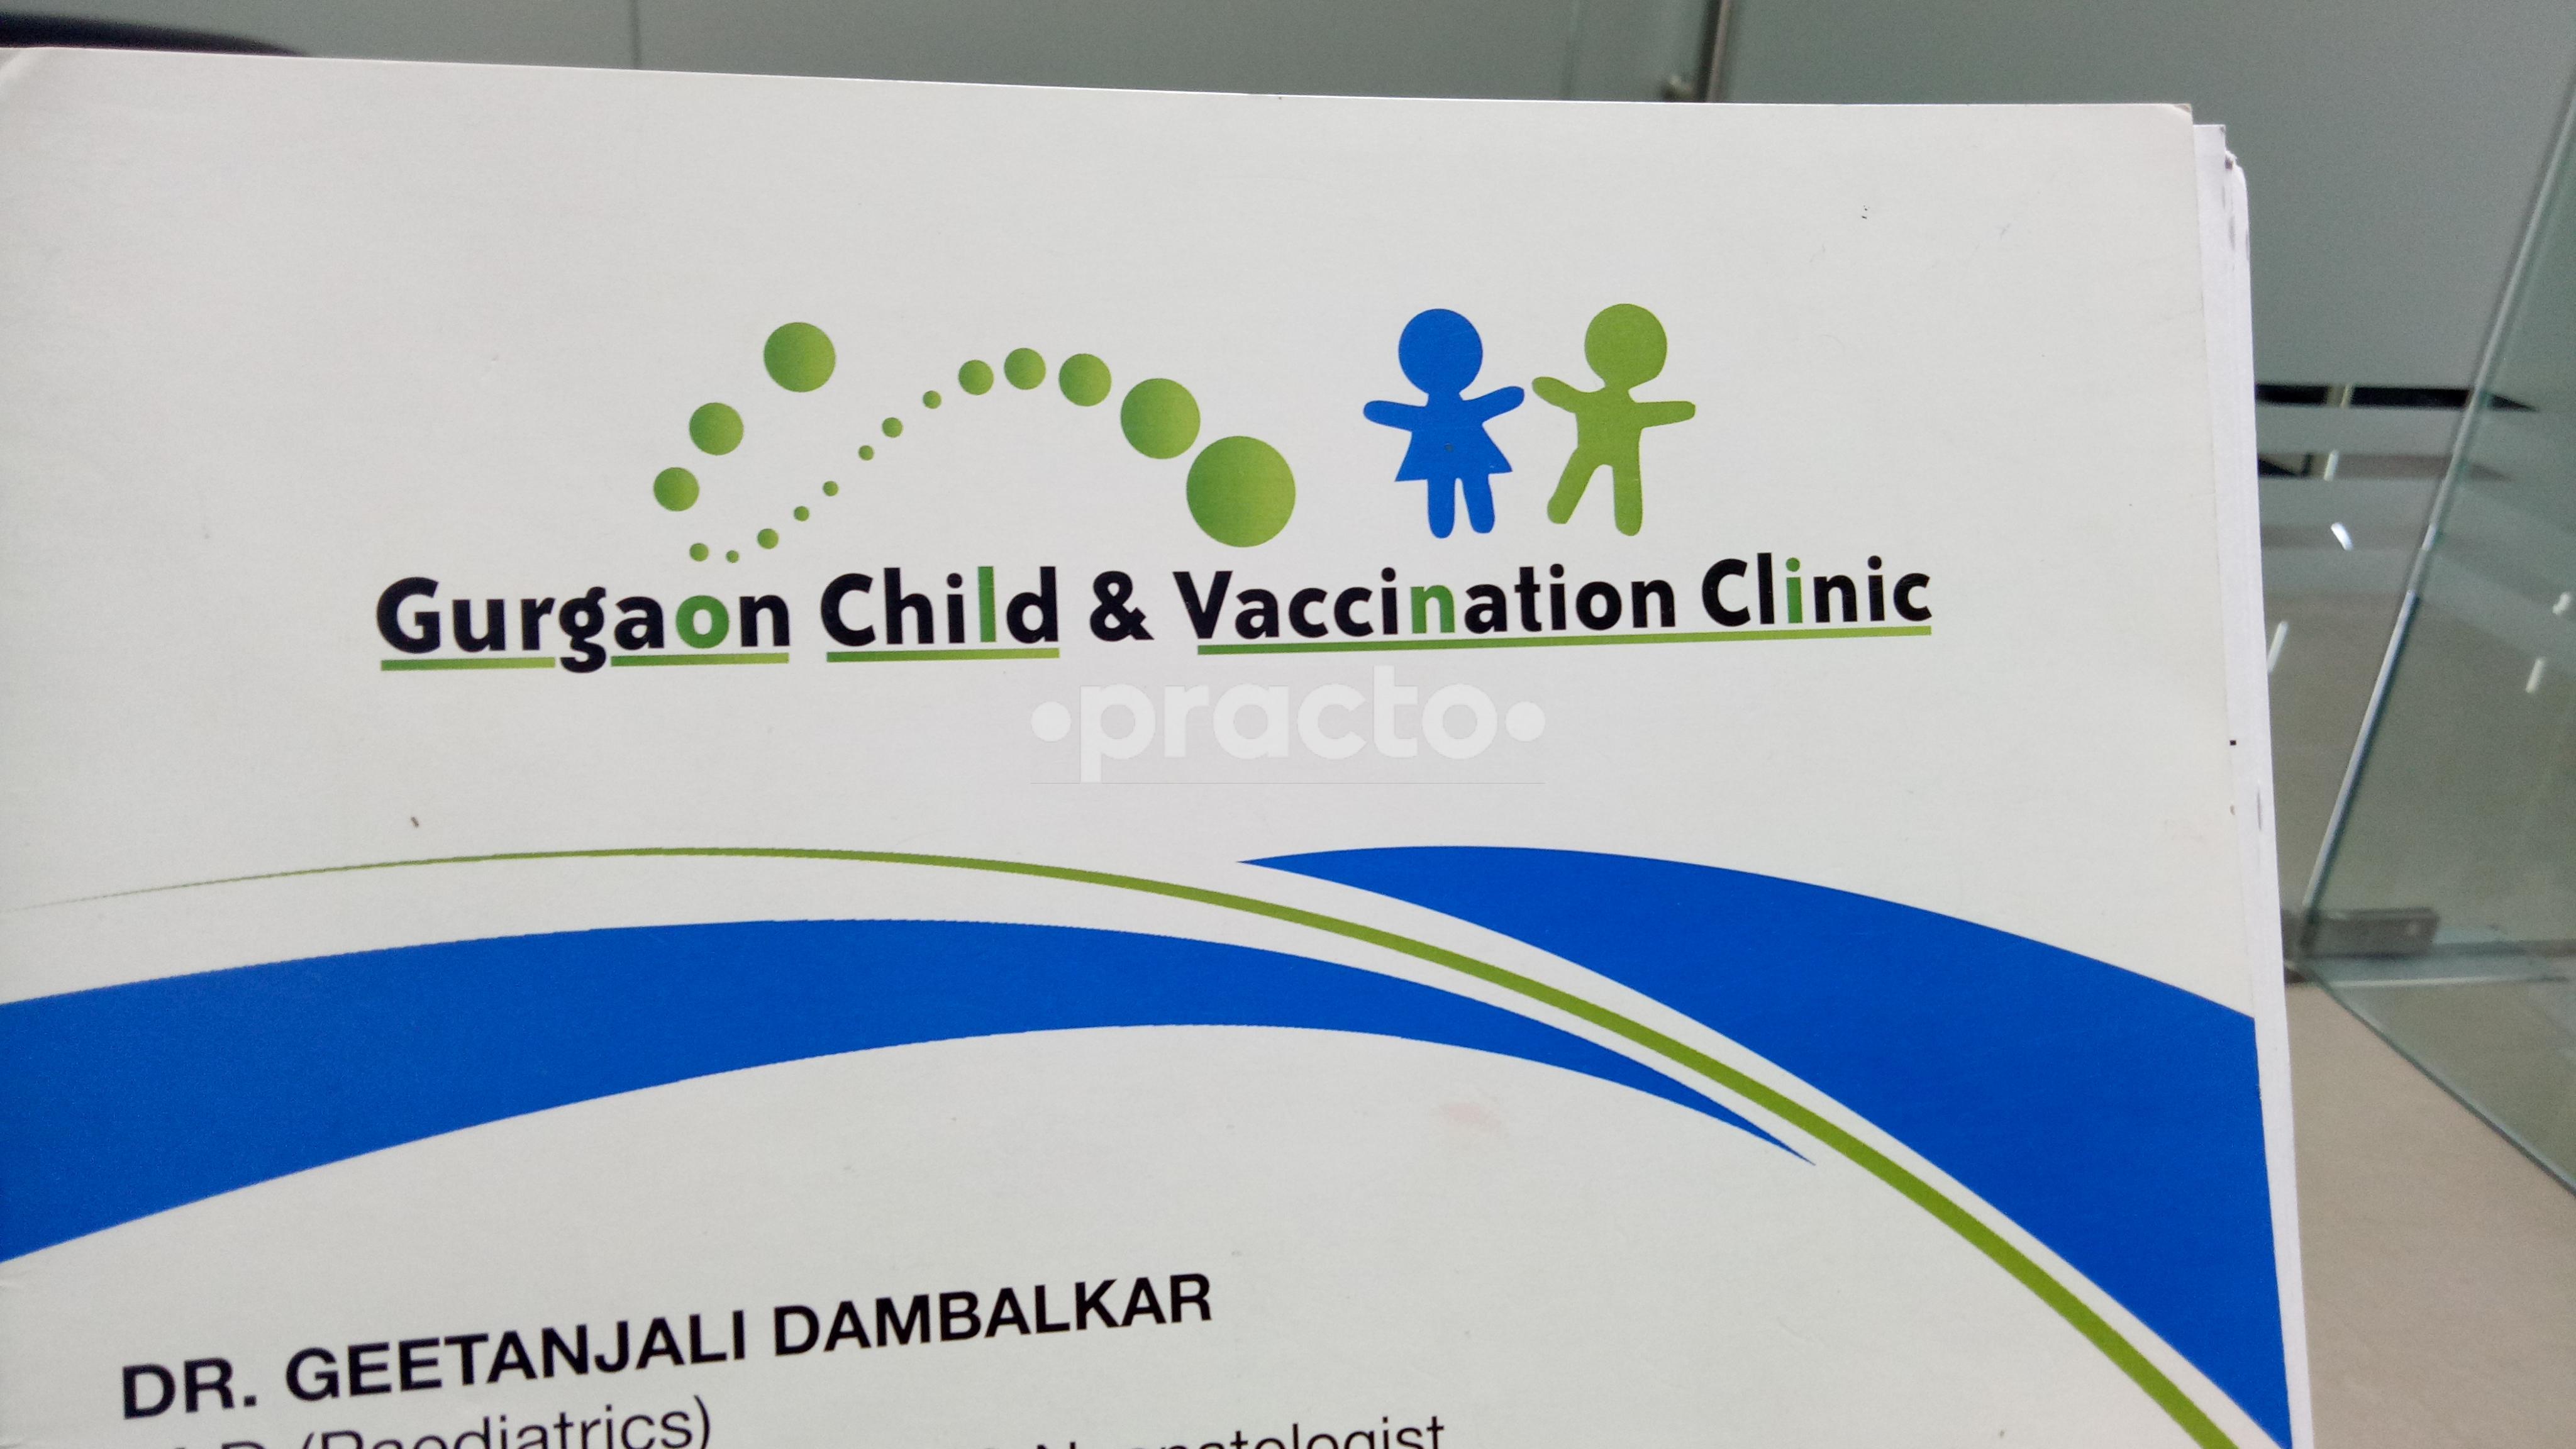 Gurgaon Child & Vaccination Clinic